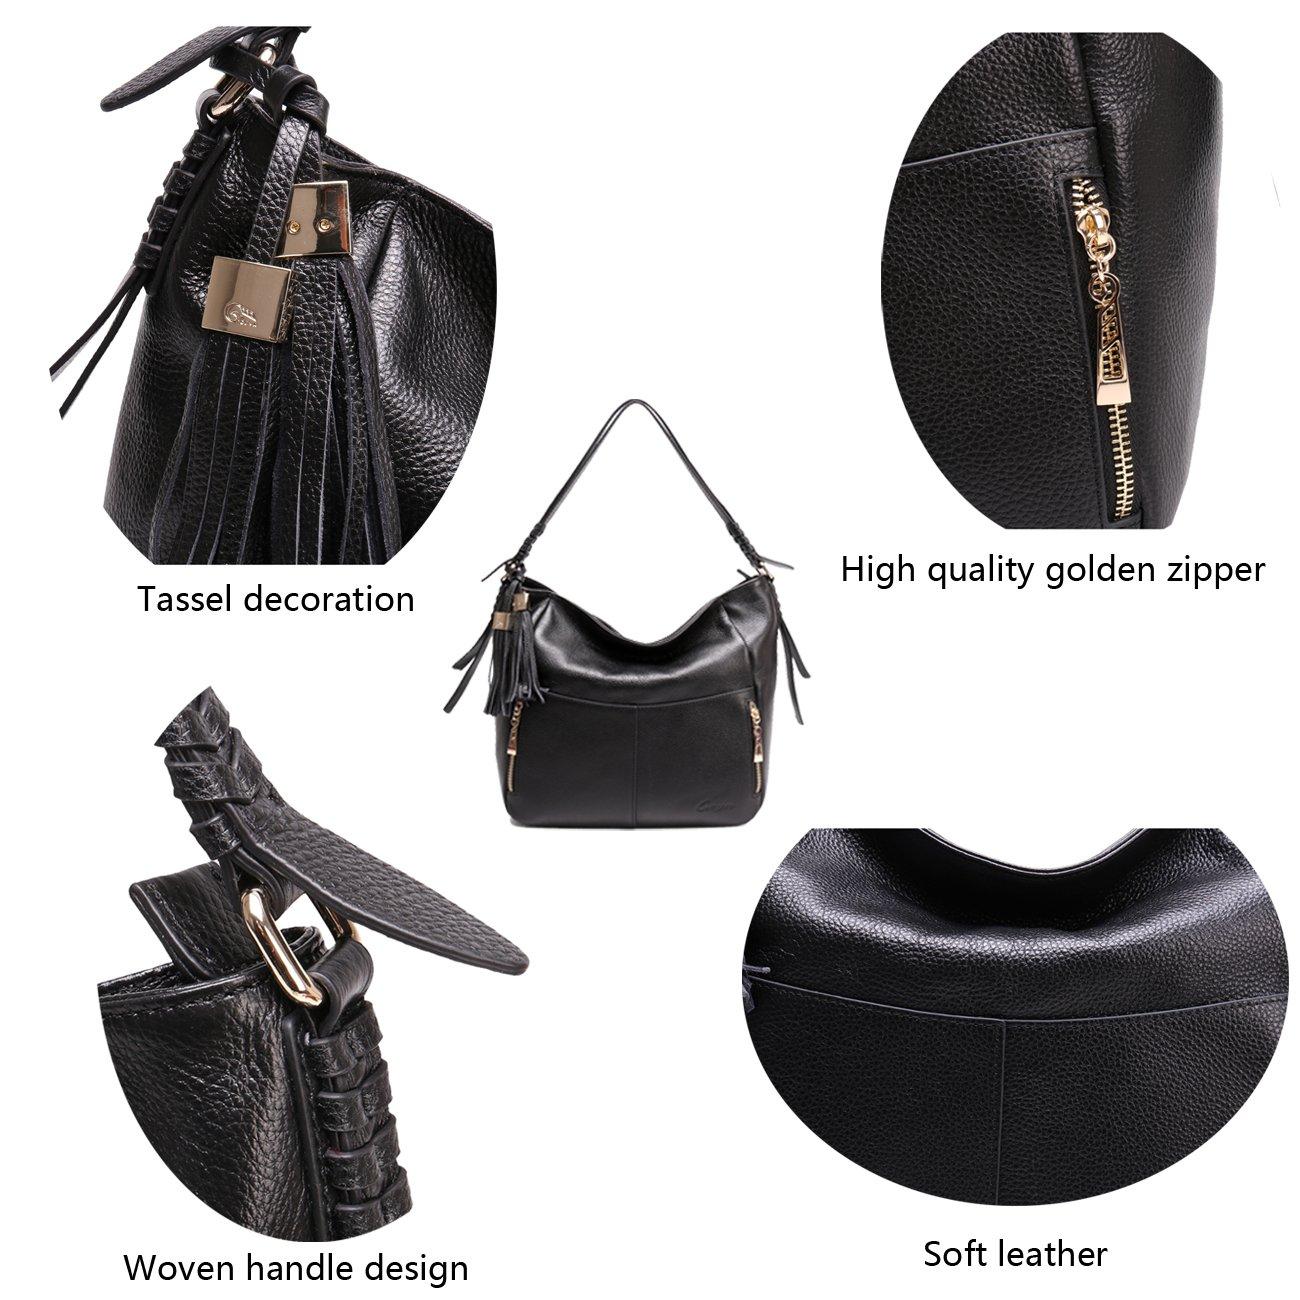 Geya Women's Fashion Genuine Leather Handbag Shoulder Handbag with Imported Soft Hot Leather (Black) by Geya (Image #6)